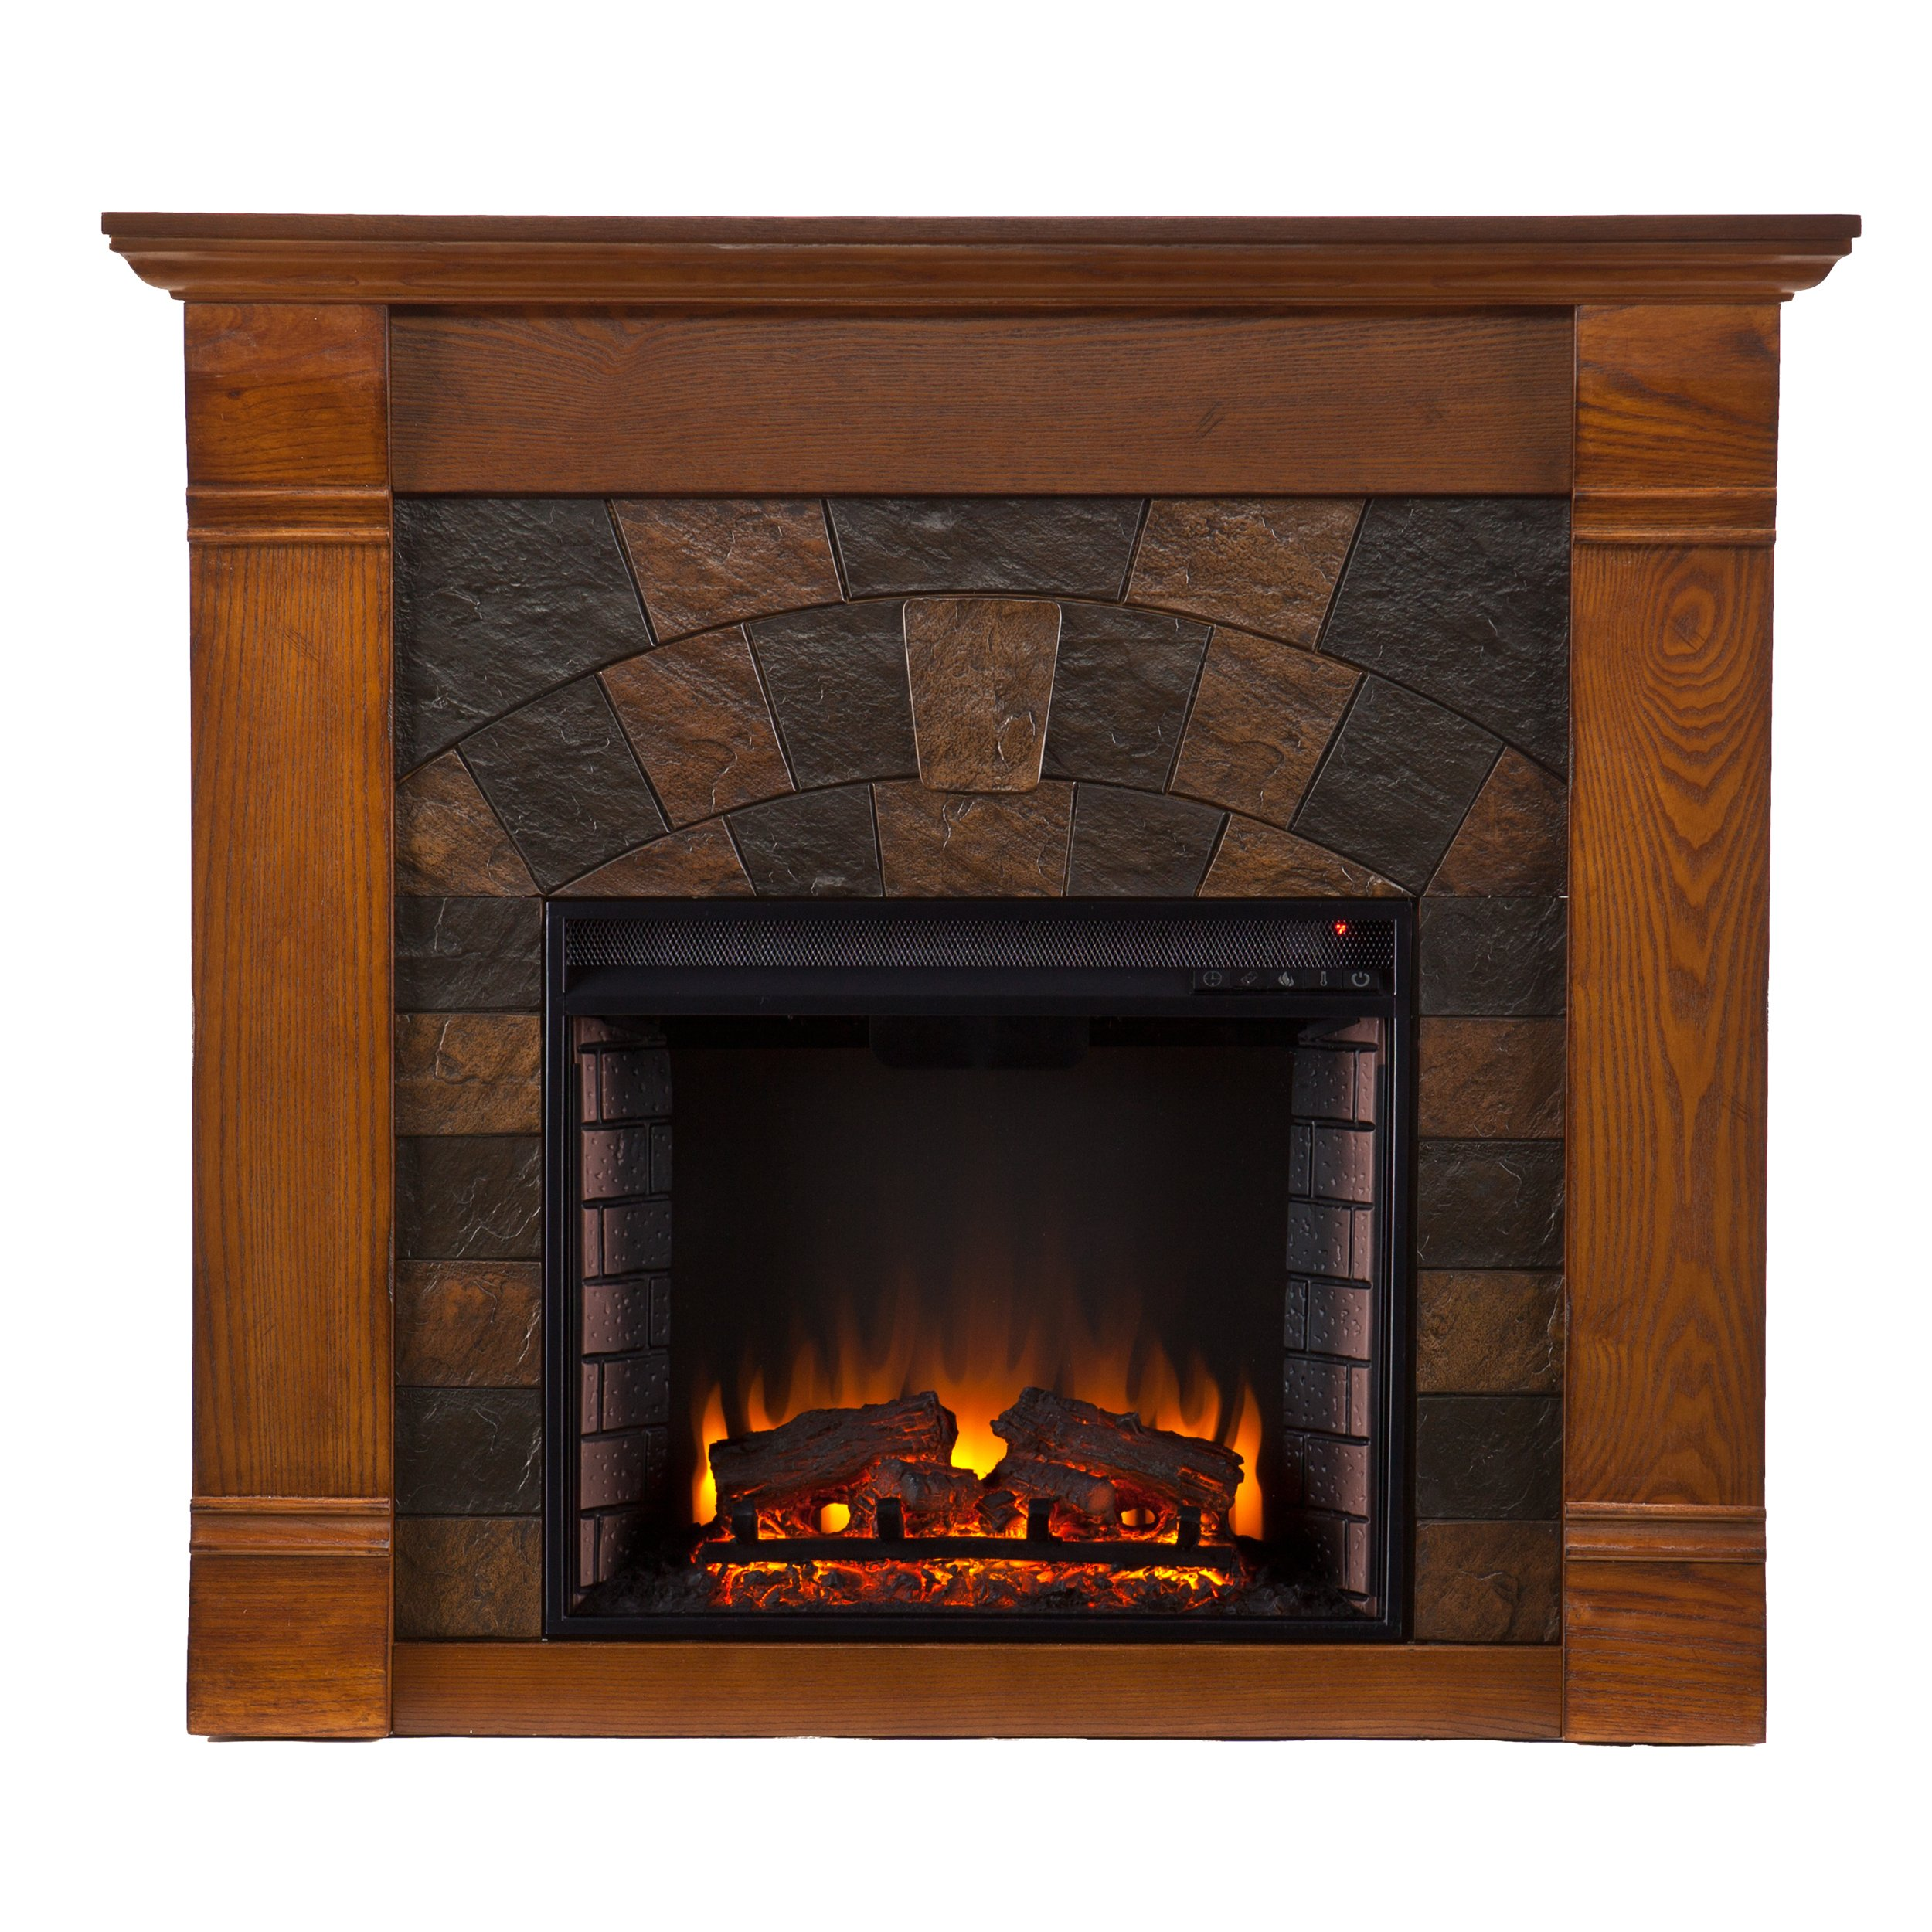 Southern Enterprises Elkmont Electric Fireplace, Salem Antique Oak Finish with Dark Earth Tone Tiles by Southern Enterprises